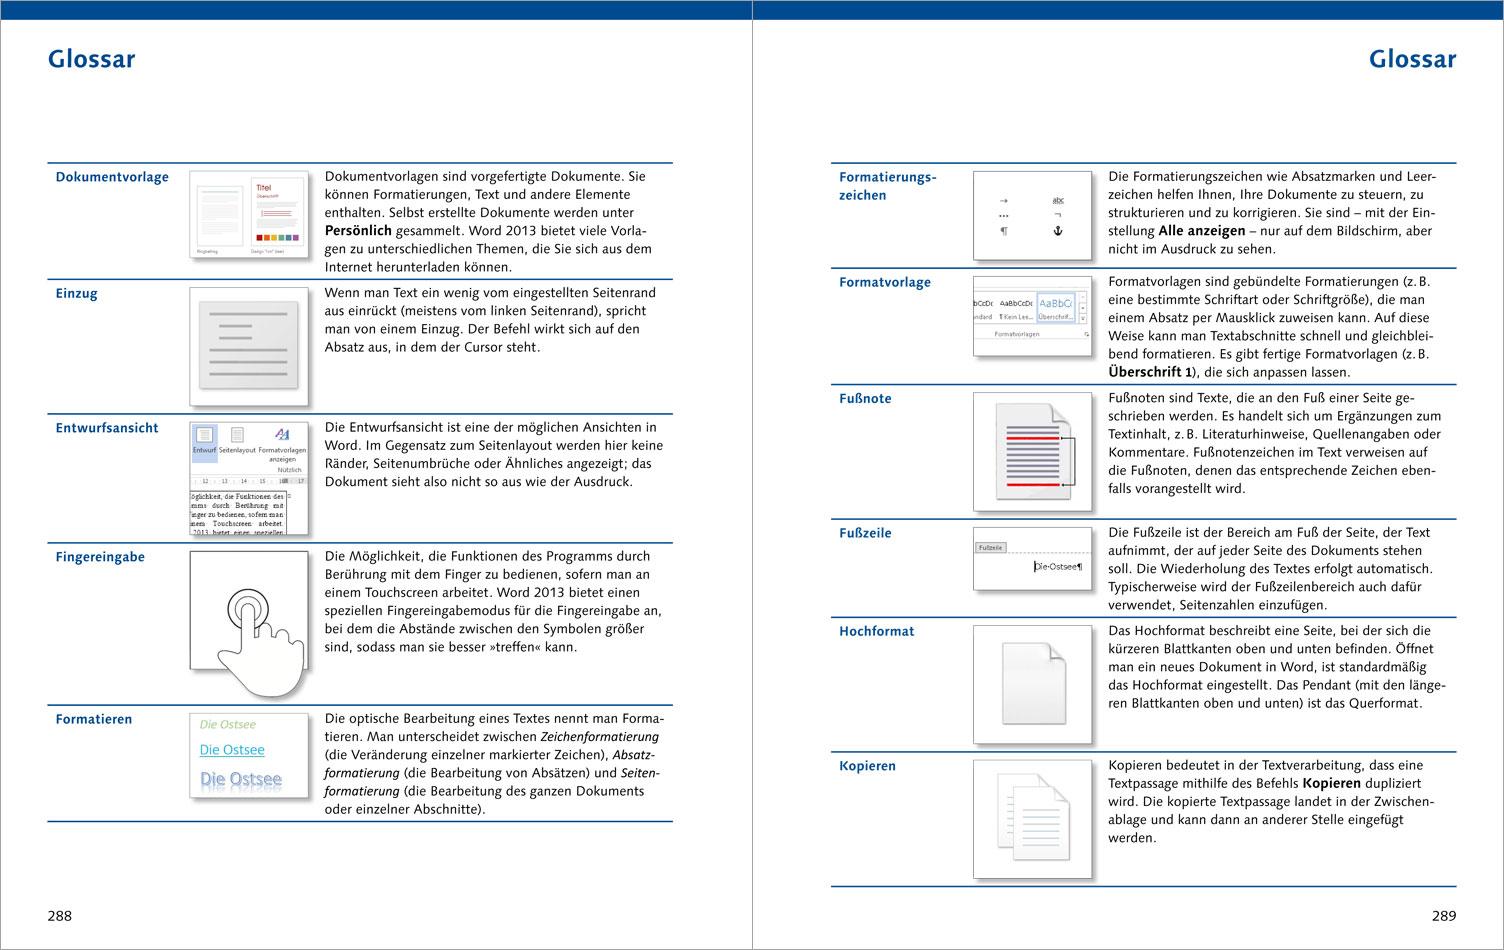 Großzügig Glossarvorlage Fotos - Entry Level Resume Vorlagen ...